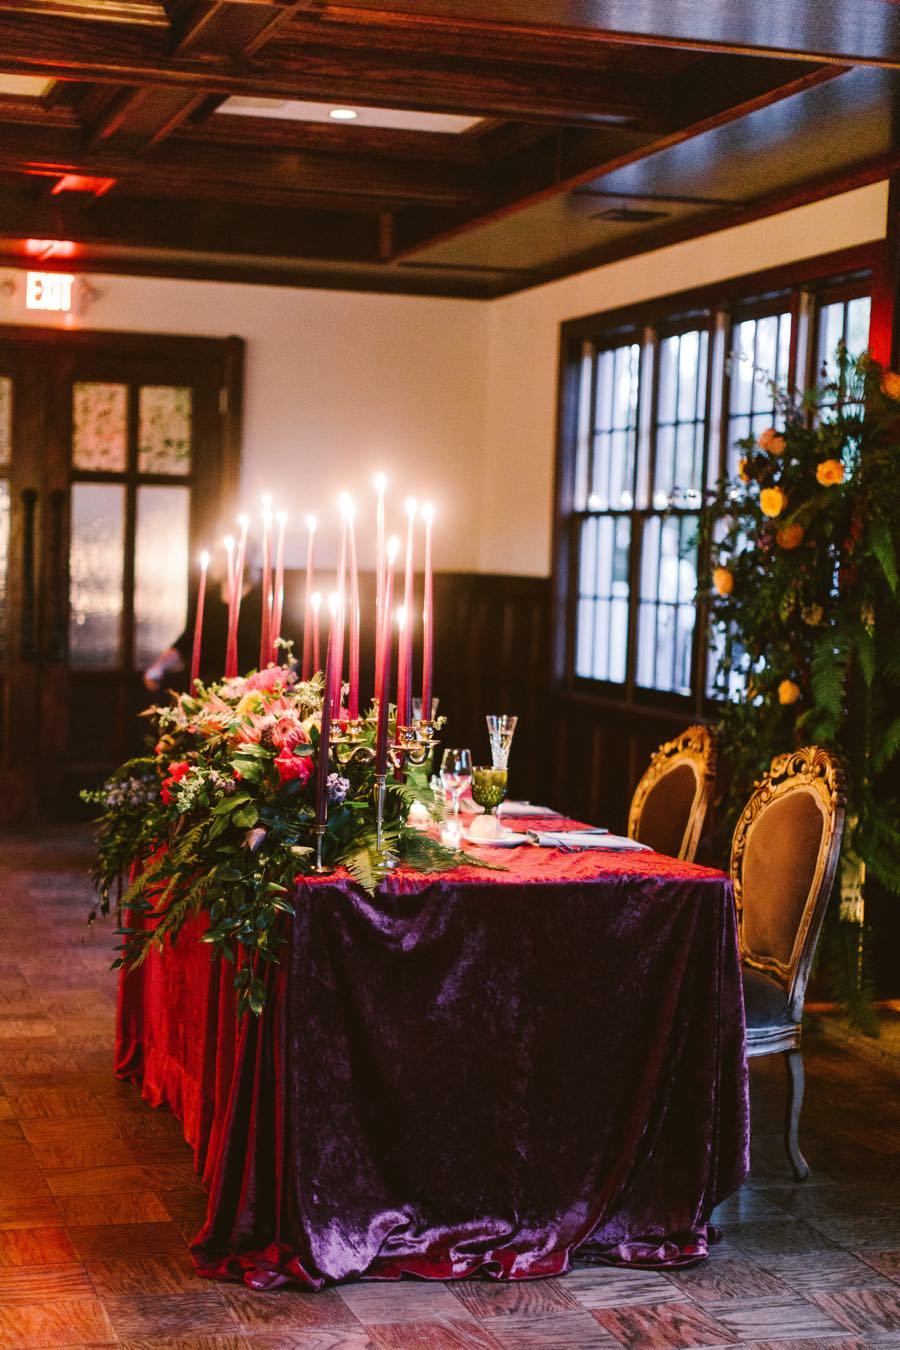 Hotel du Village bride and groom's table